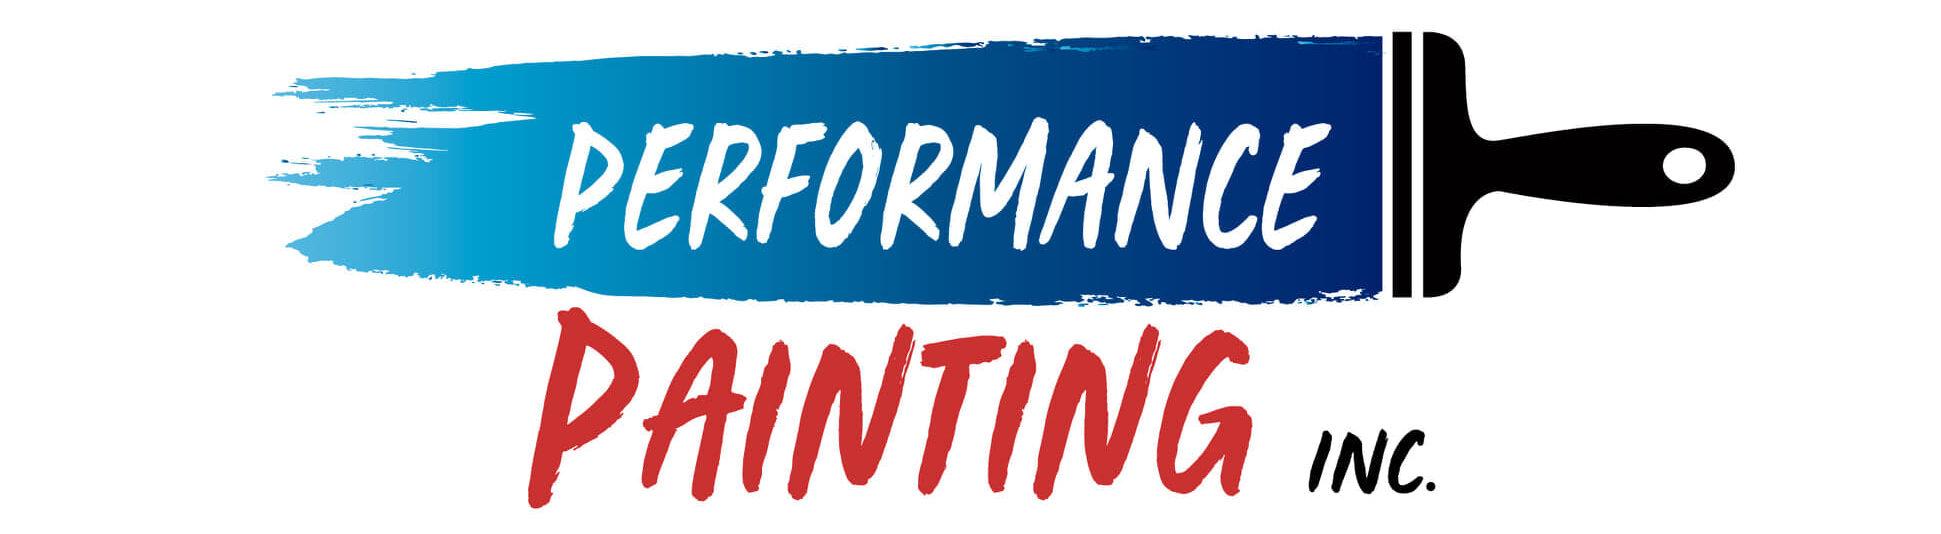 Performance Painting, Inc.